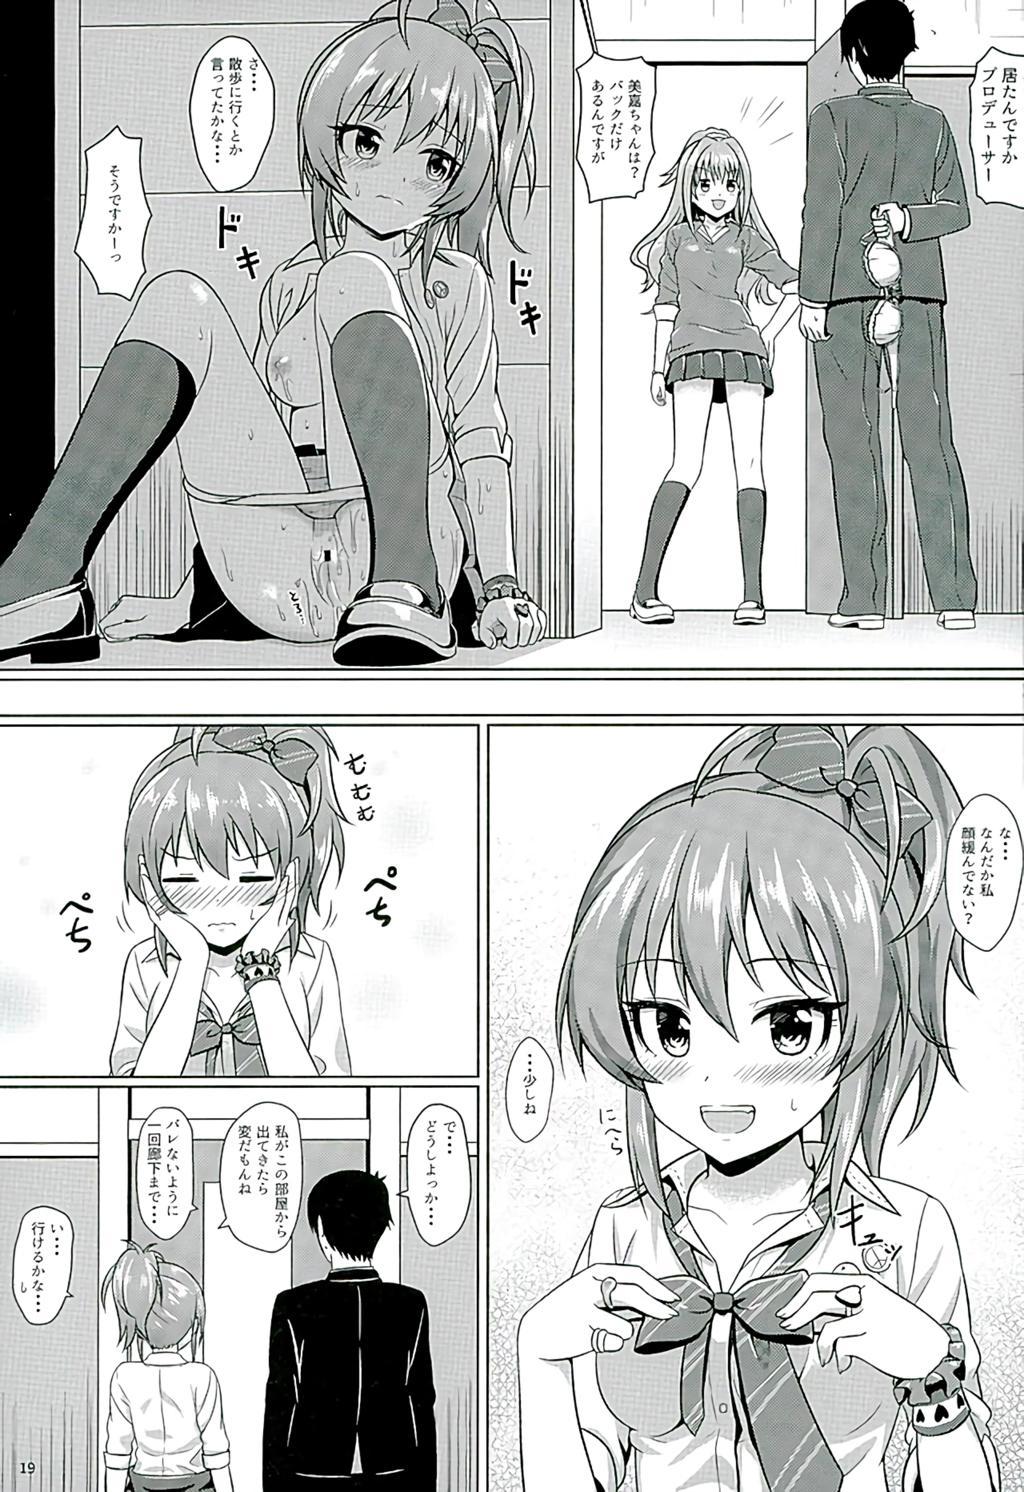 Hajimete no Jikan 17